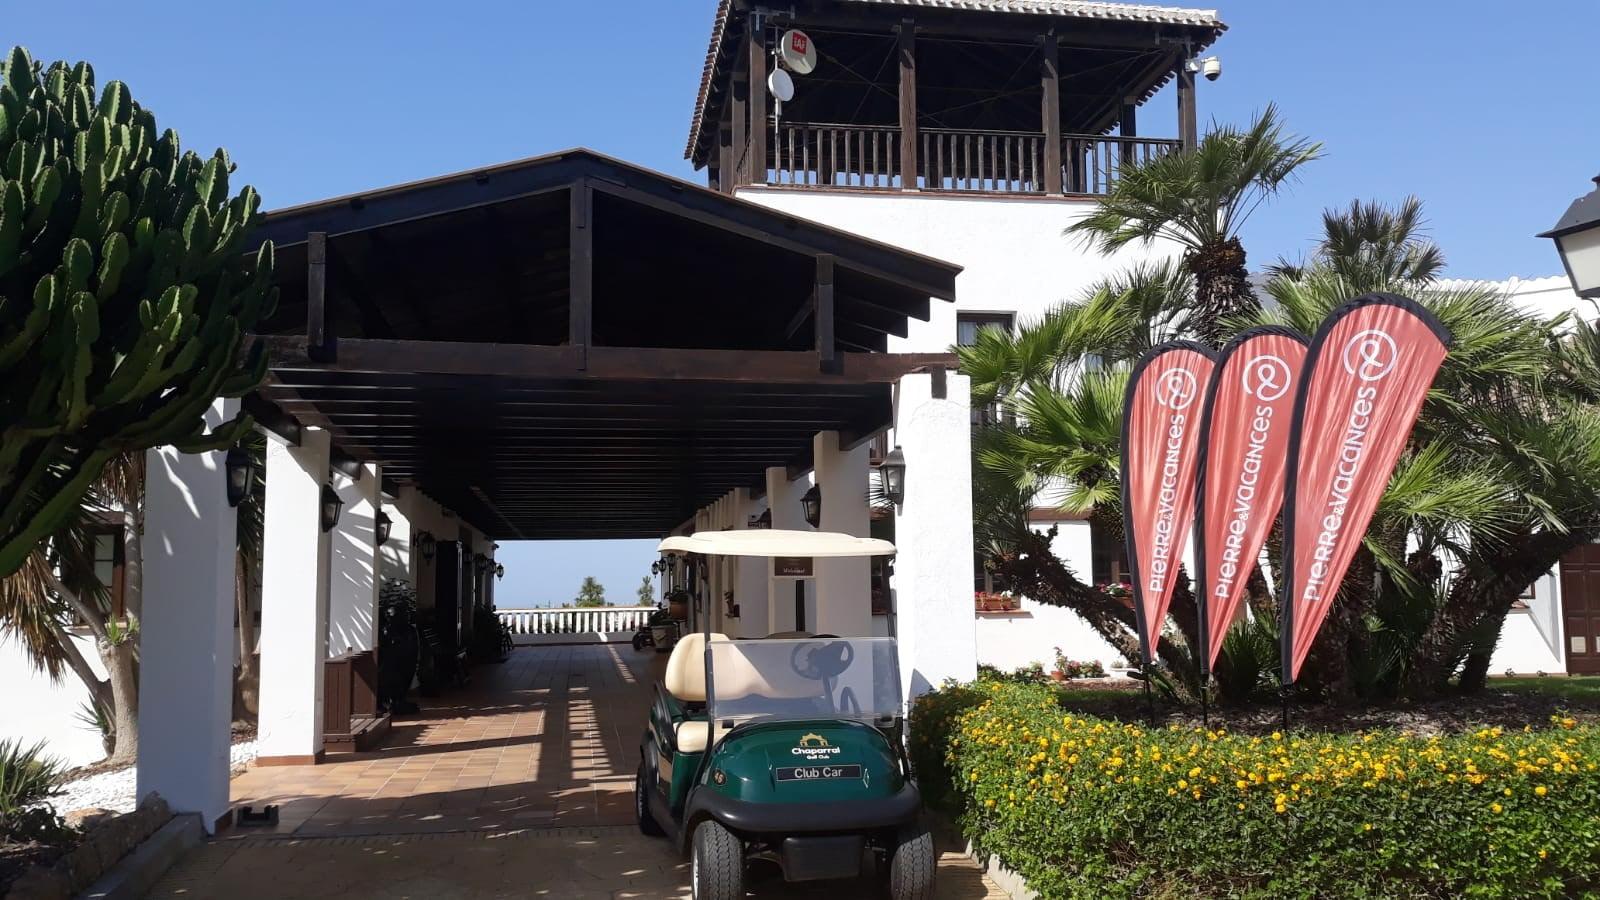 carrito de golf frente a un hotel y pancartas de Pierre et Vacances